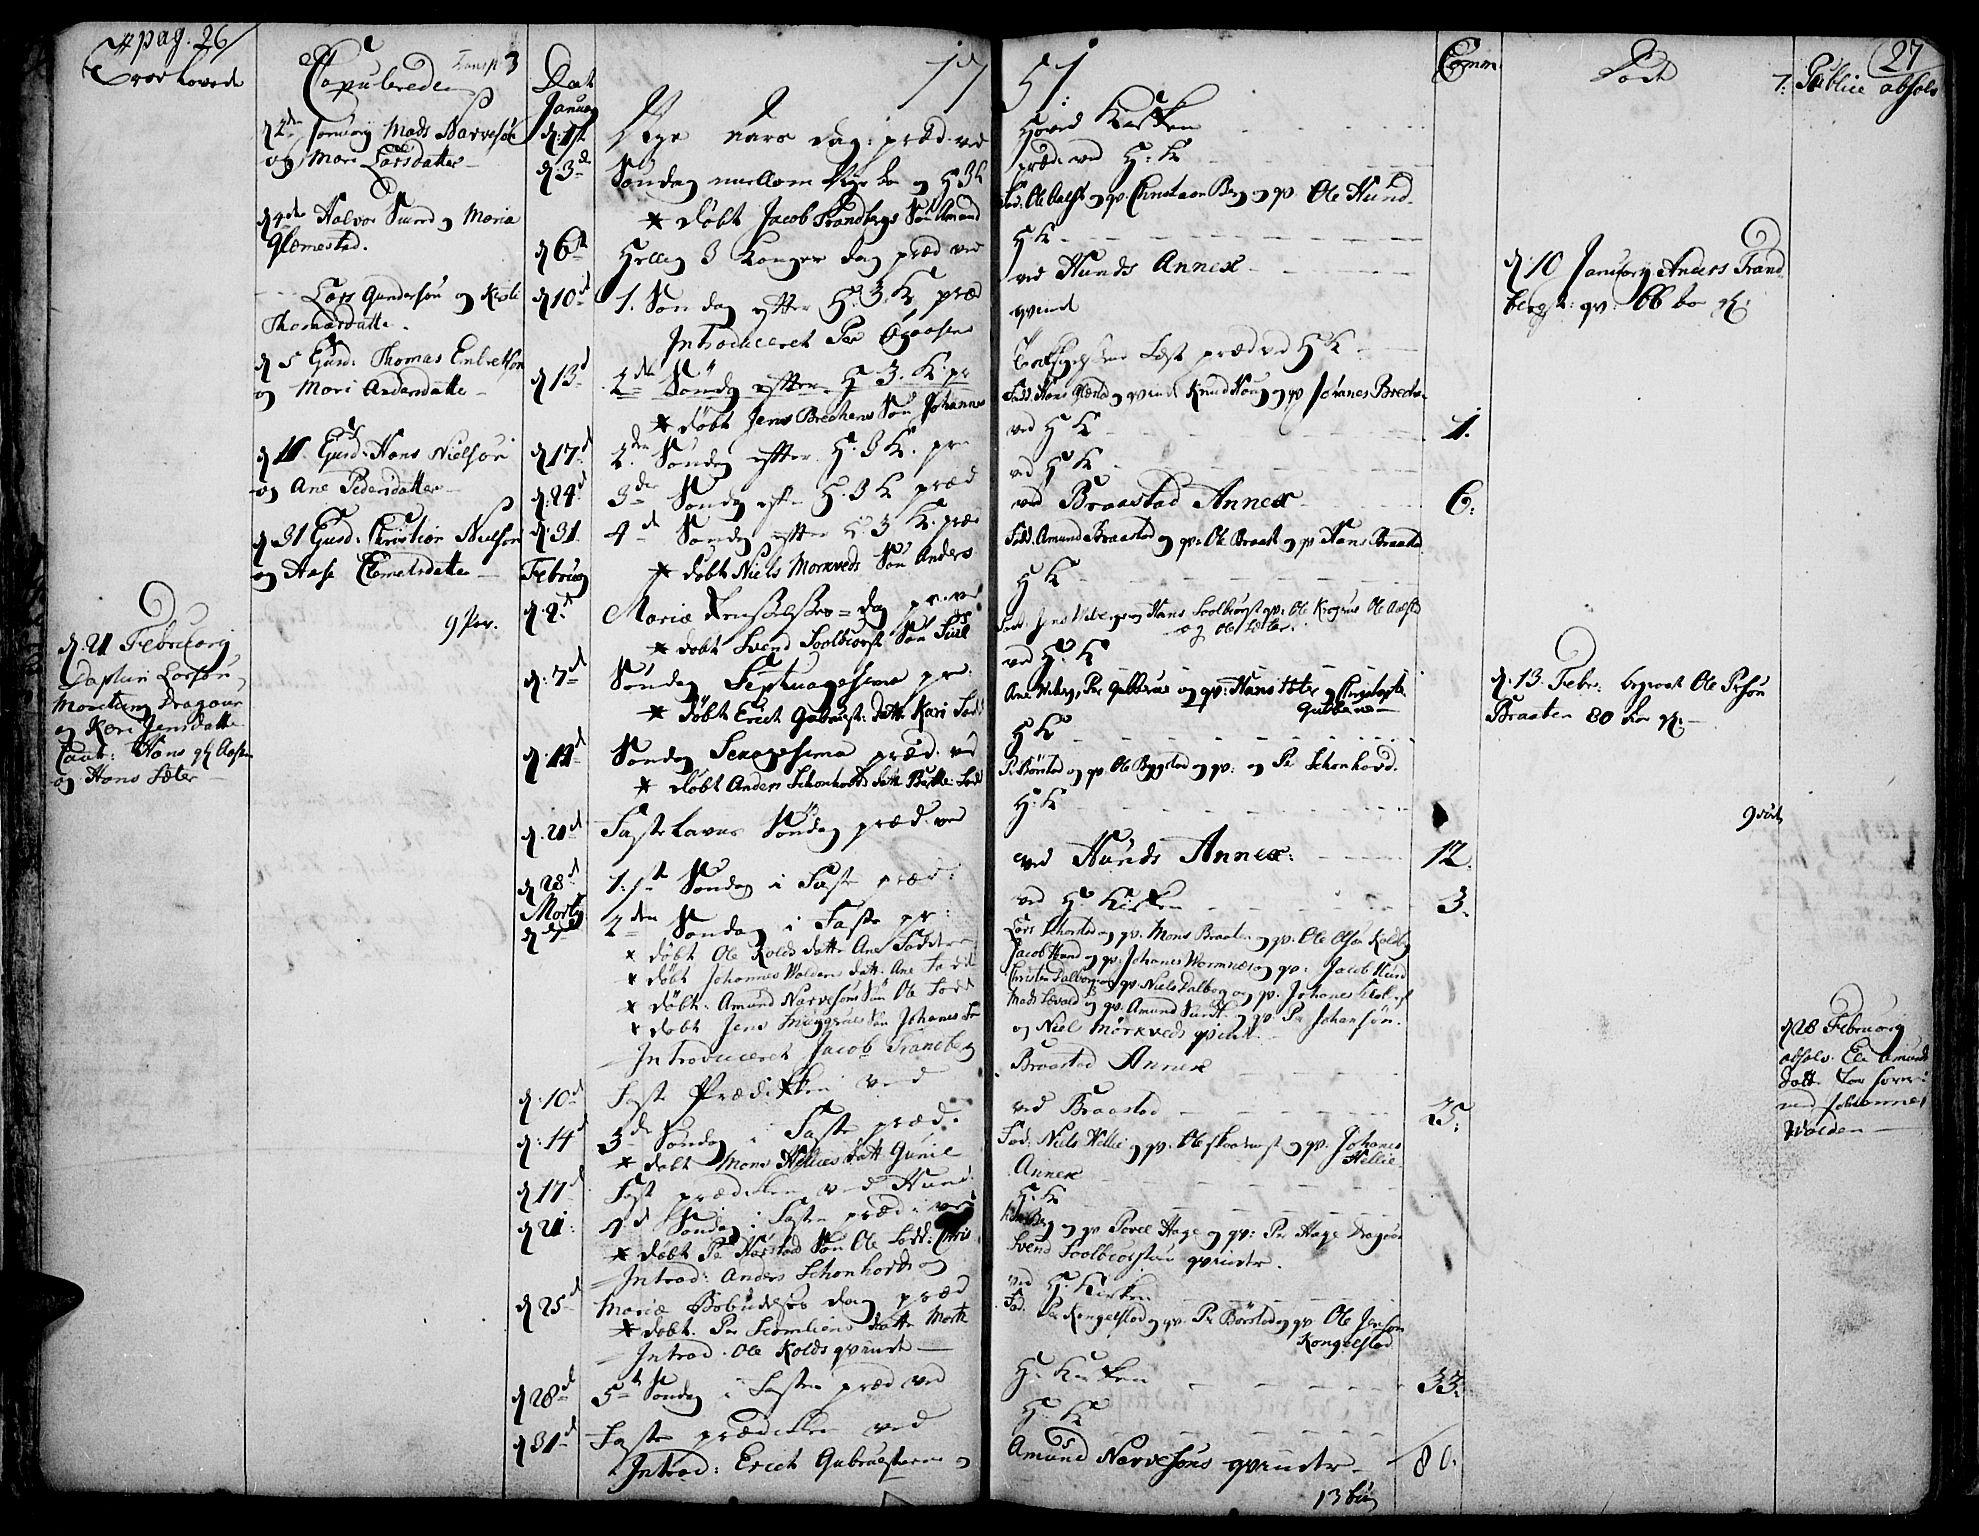 SAH, Vardal prestekontor, H/Ha/Haa/L0002: Ministerialbok nr. 2, 1748-1776, s. 26-27